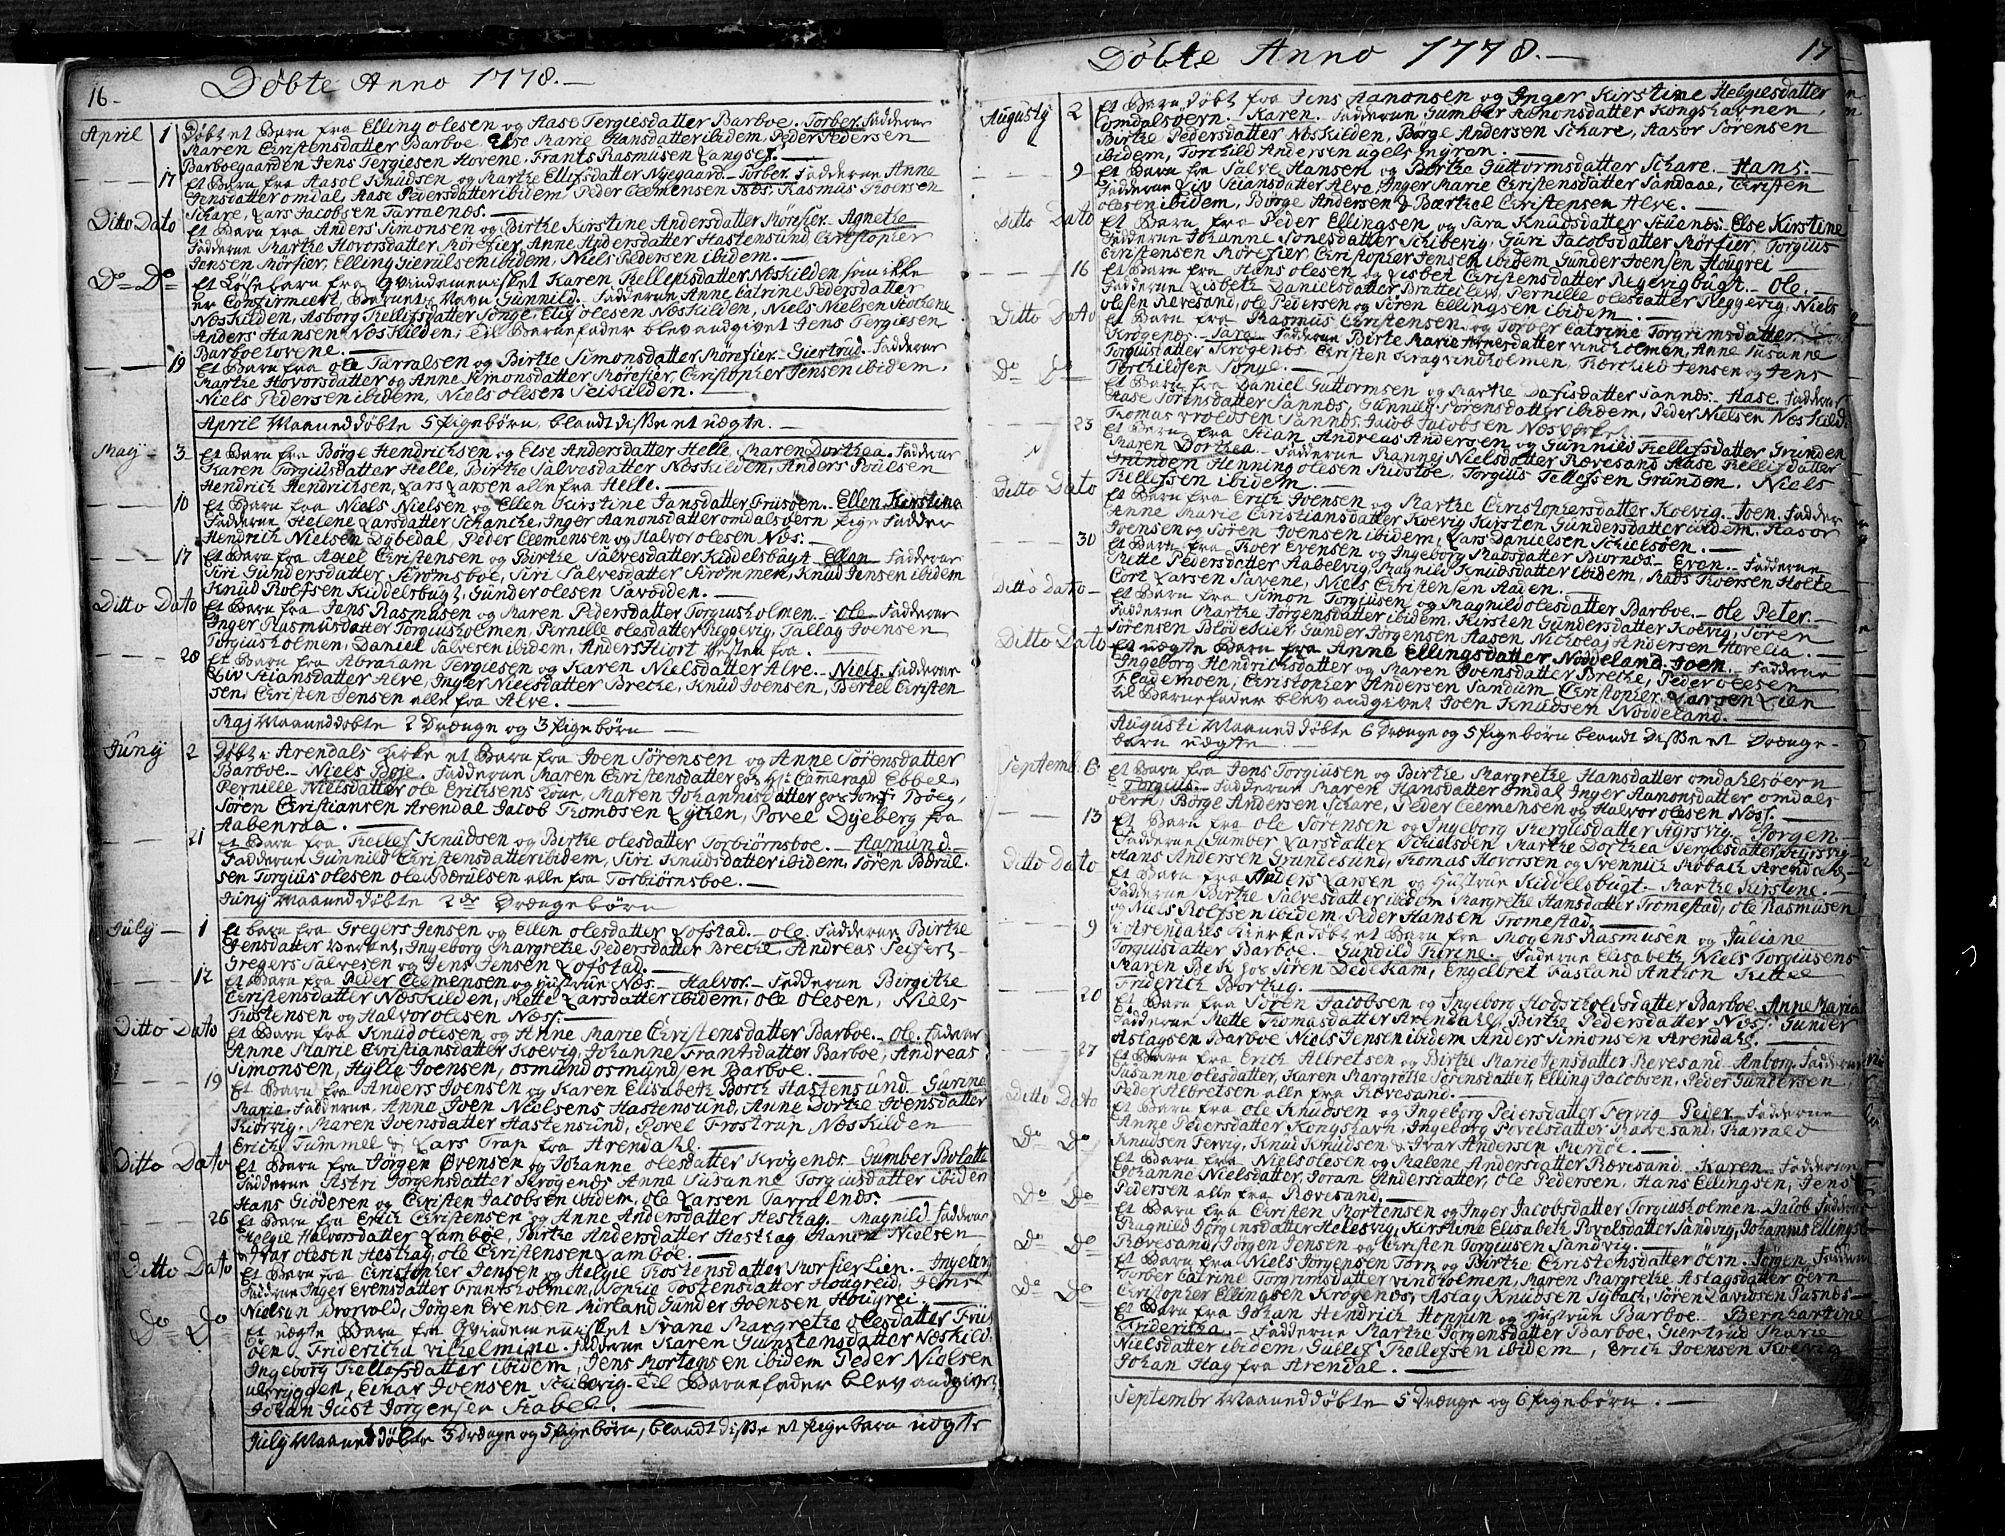 SAK, Tromøy sokneprestkontor, F/Fa/L0002: Ministerialbok nr. A 2, 1773-1808, s. 16-17